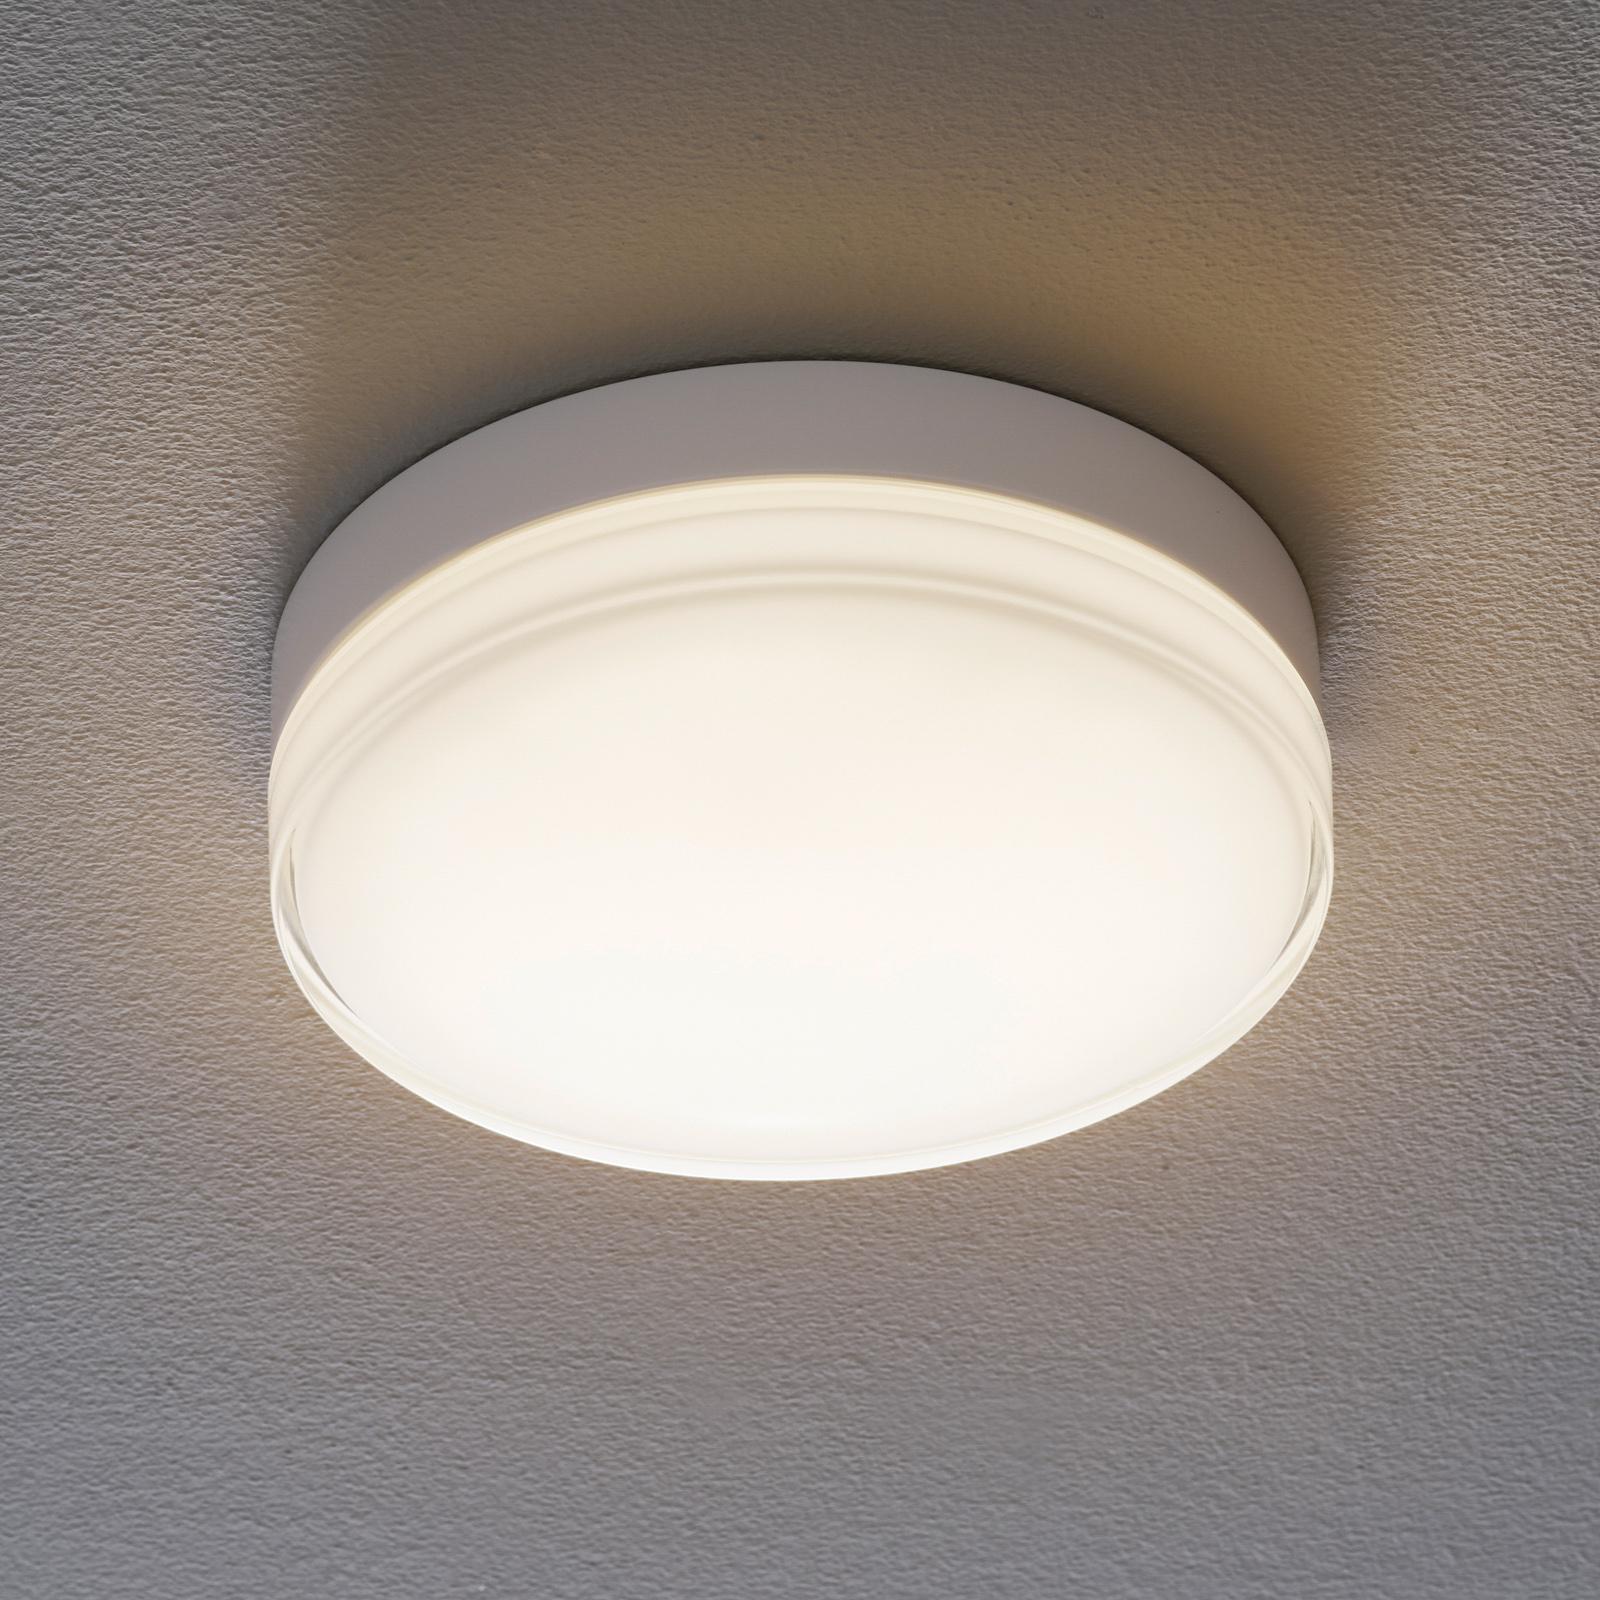 BEGA 12128 LED-loftlampe DALI 930 hvid 26 cm